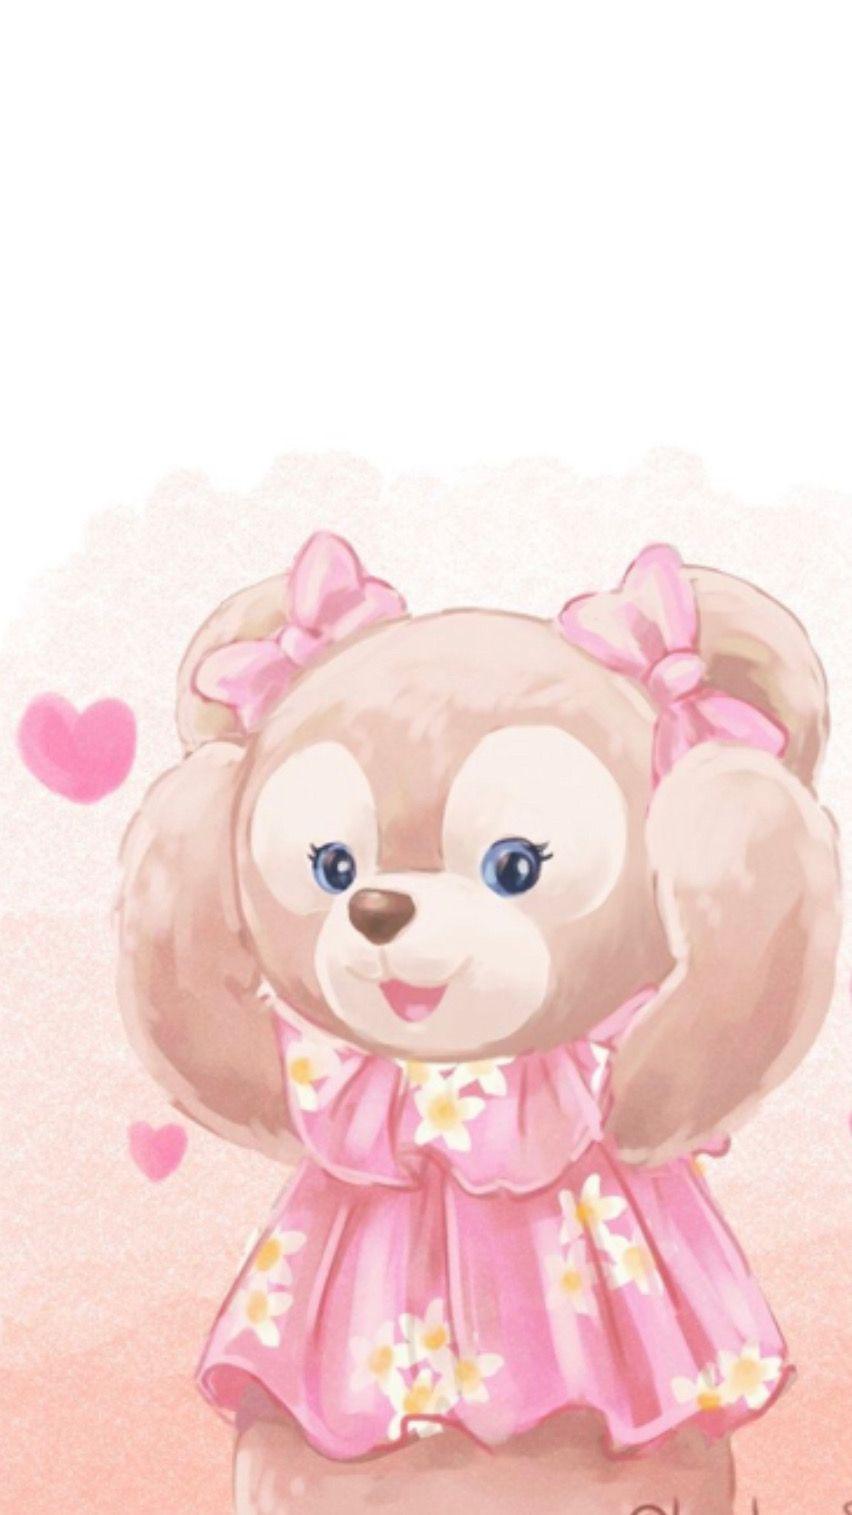 Обои little, Teddy, Медведь, bed, cute, мишка. Разное foto 17